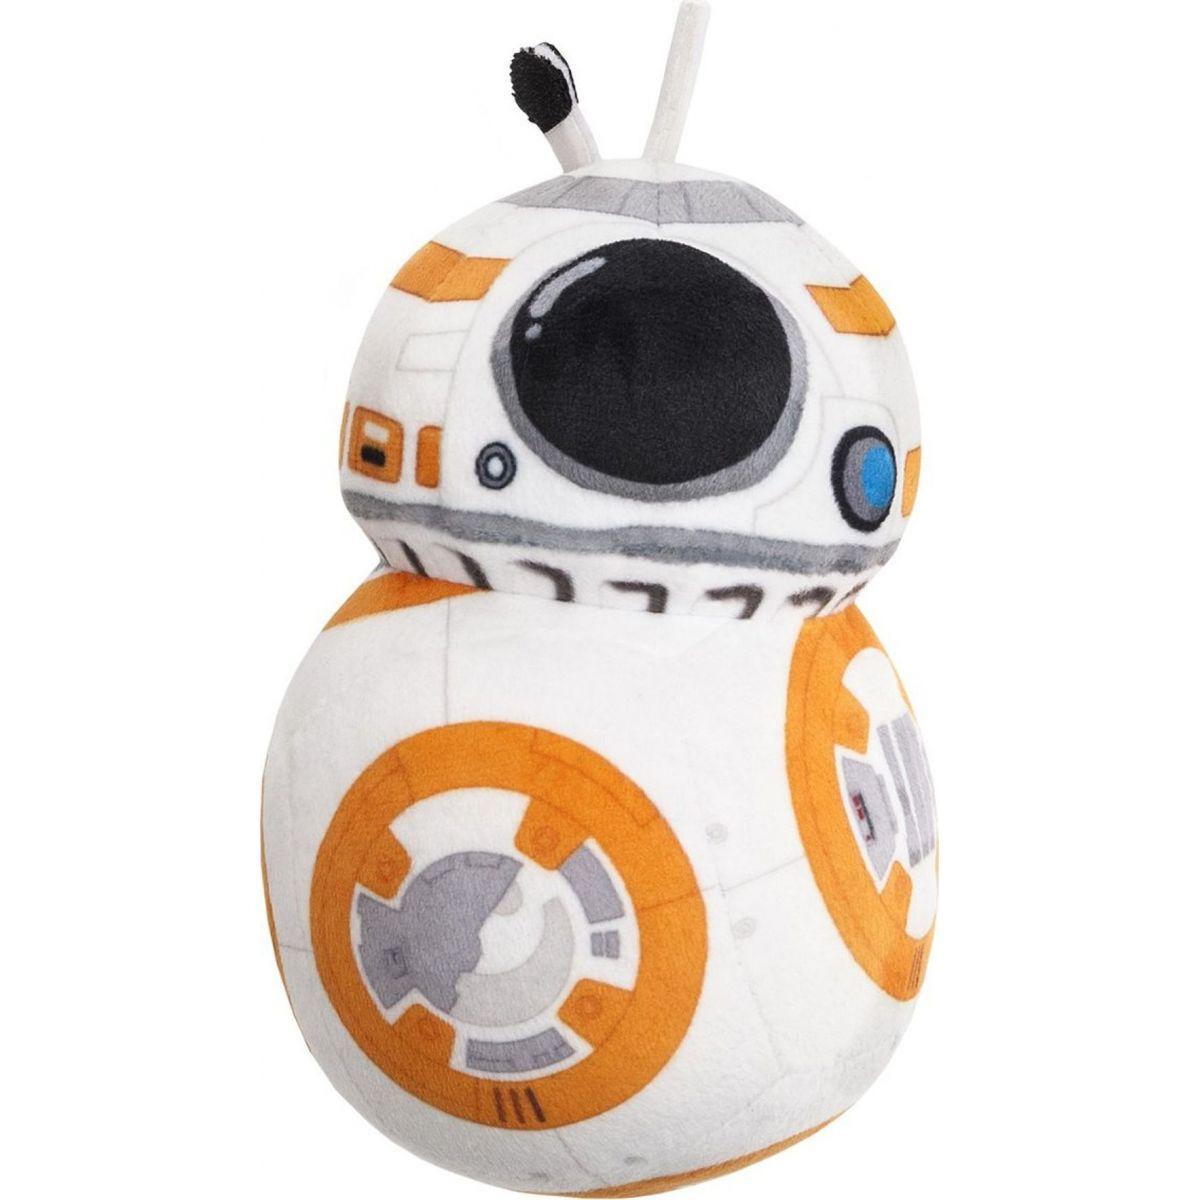 Star Wars VII Lead Droid 17 cm